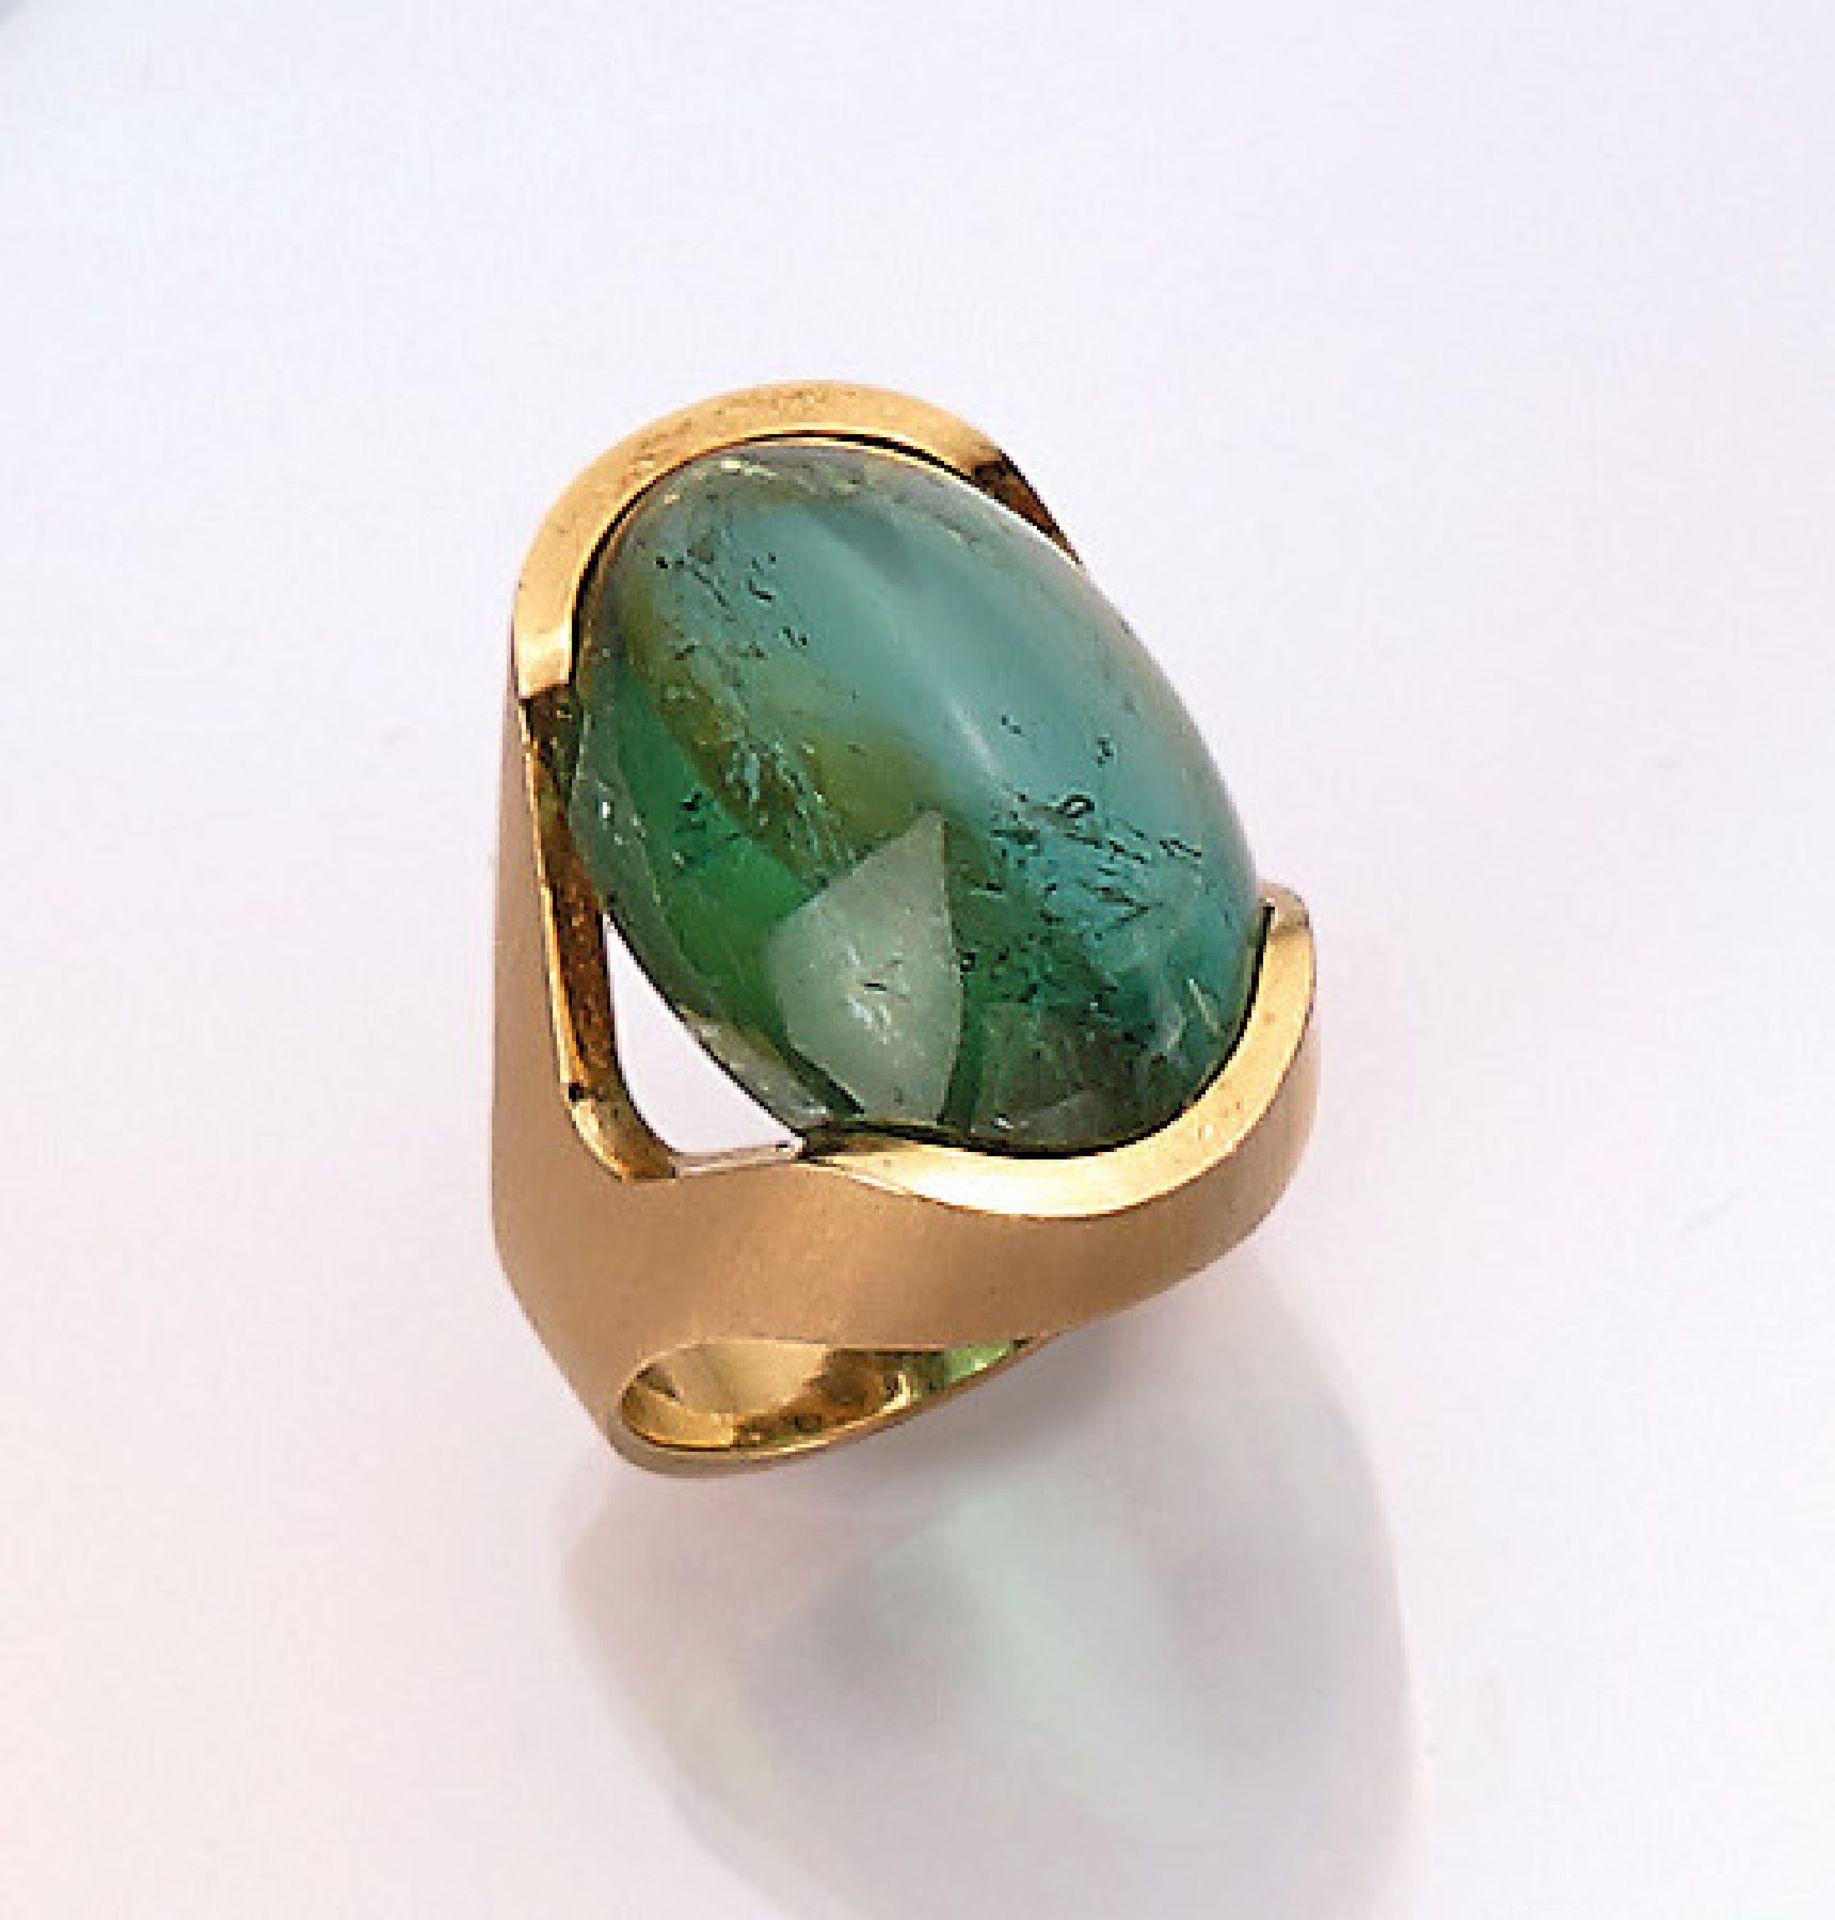 18 kt Gold Ring mit Turmalin, GG 750/000, ovaler Turmalincabochon ca. 8.50 ct, Schiene sat.,